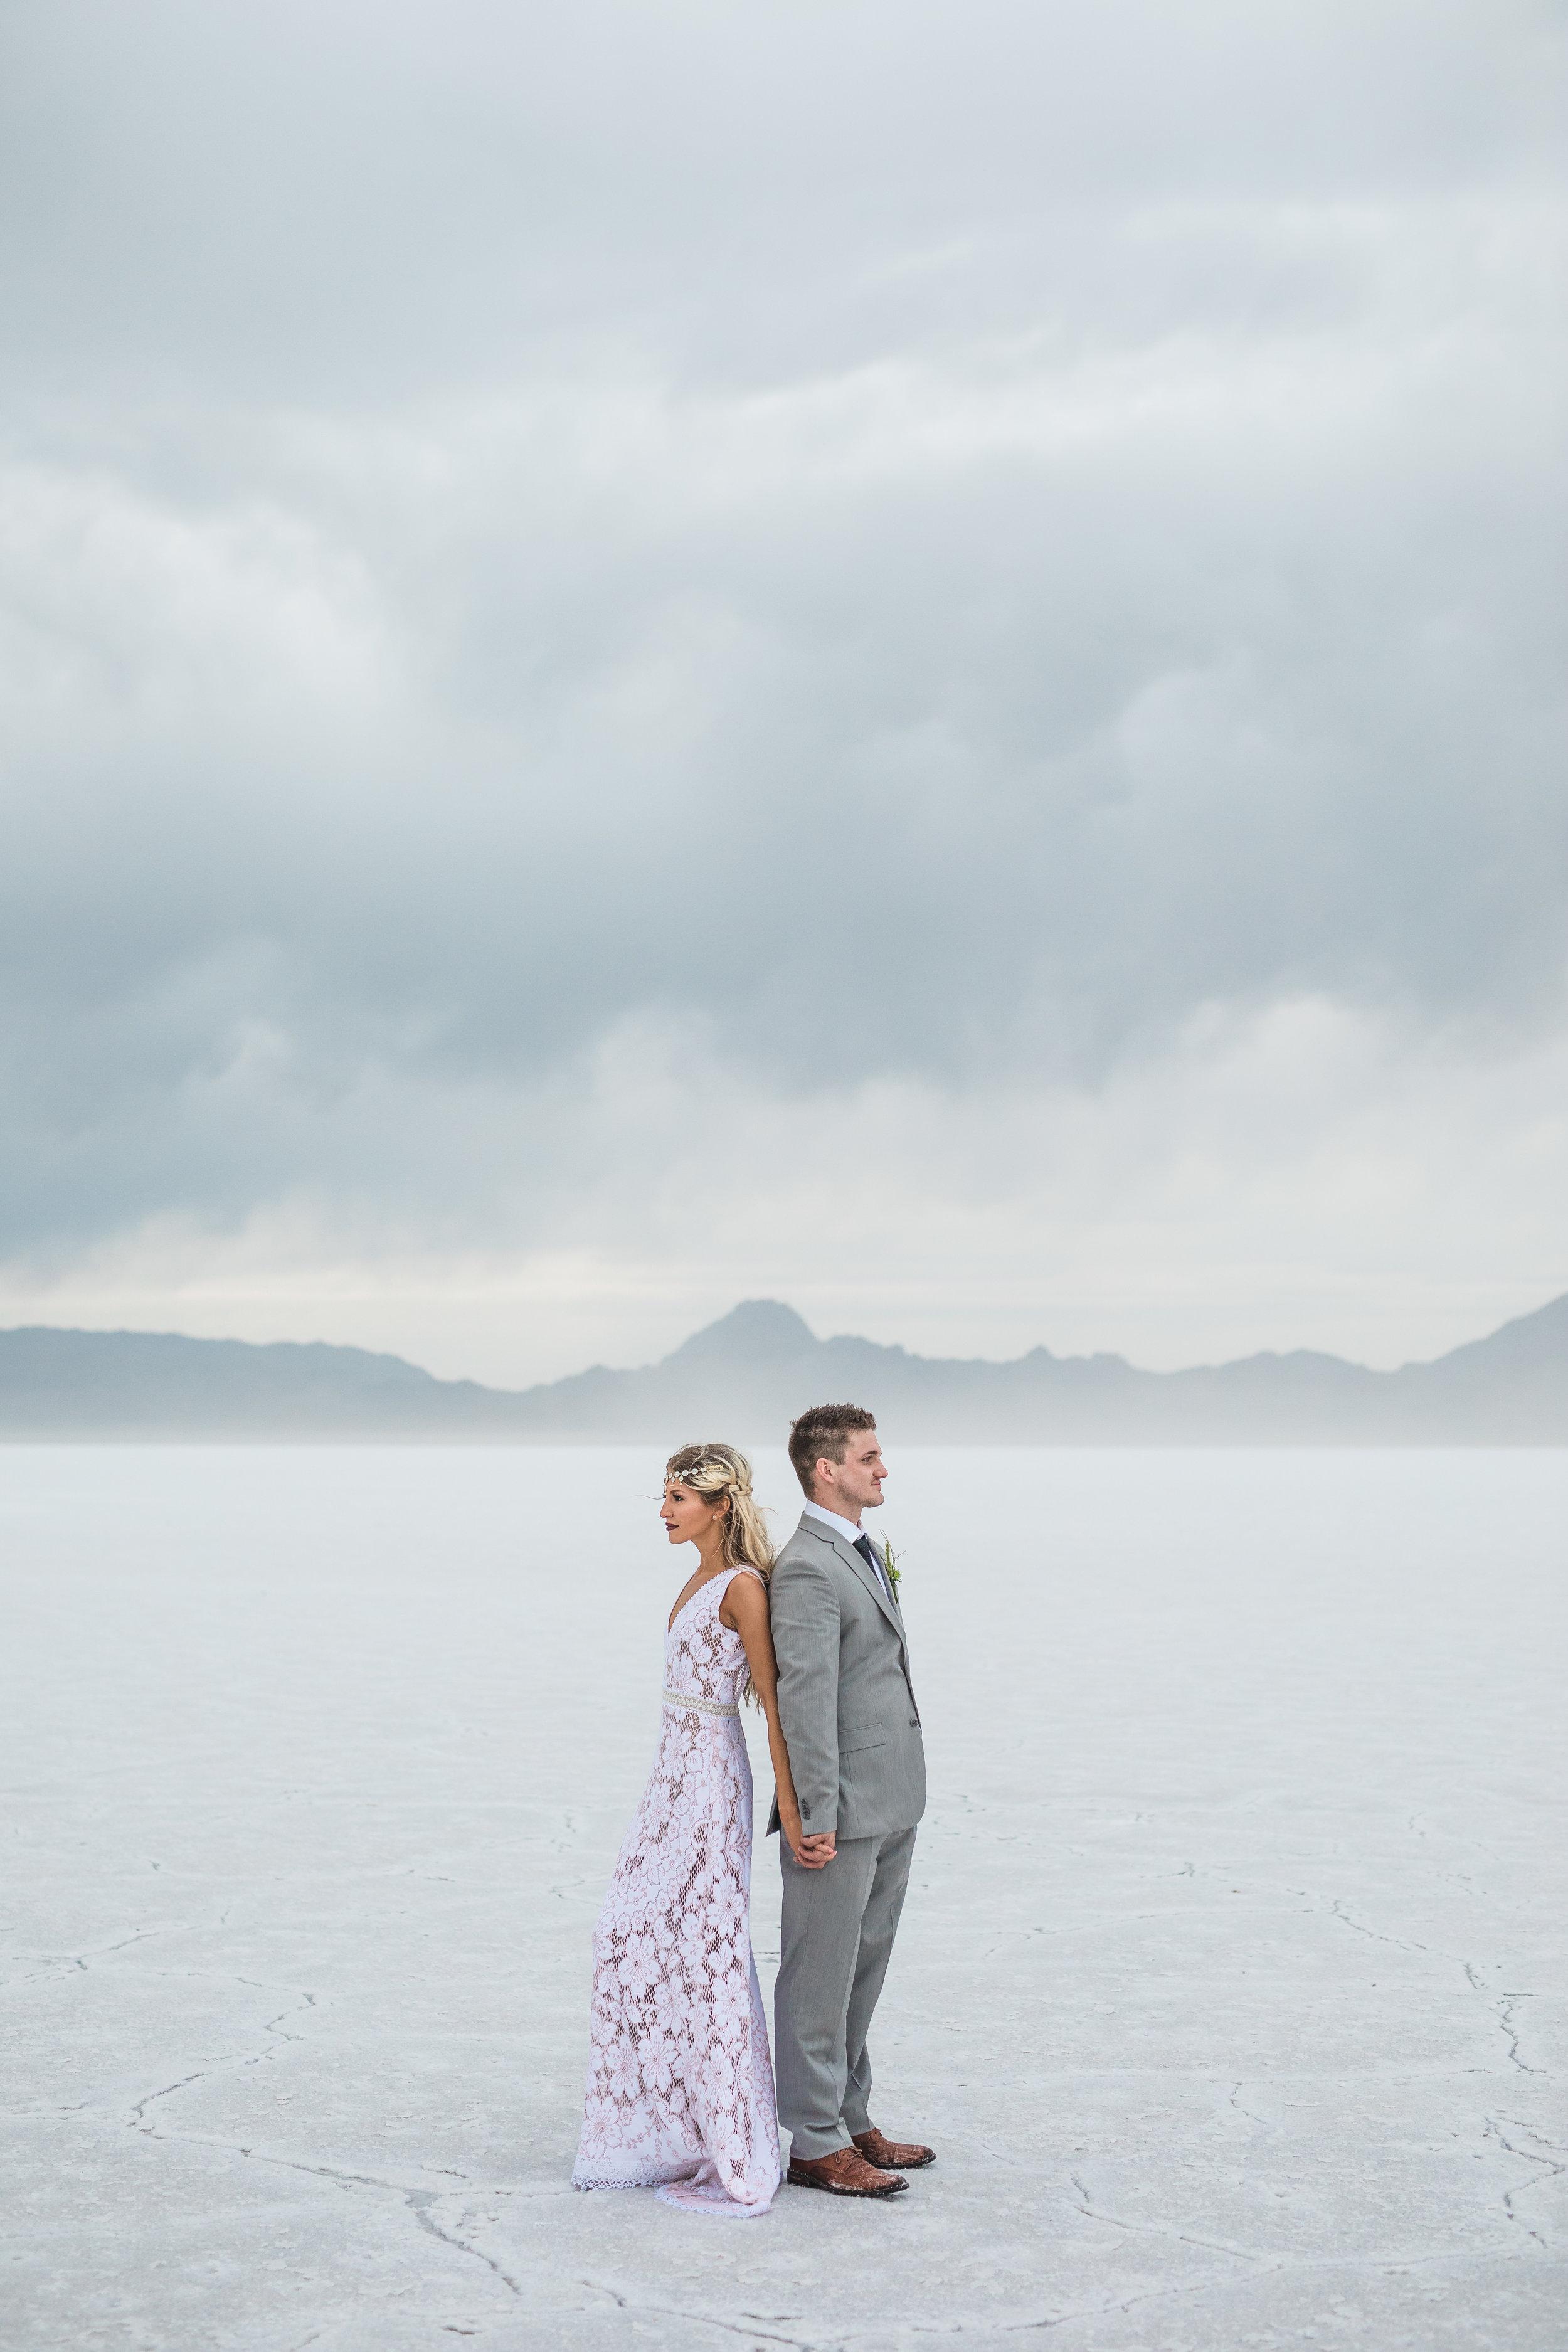 Fine art adventure wedding photography Kyle and Tori Sheppard